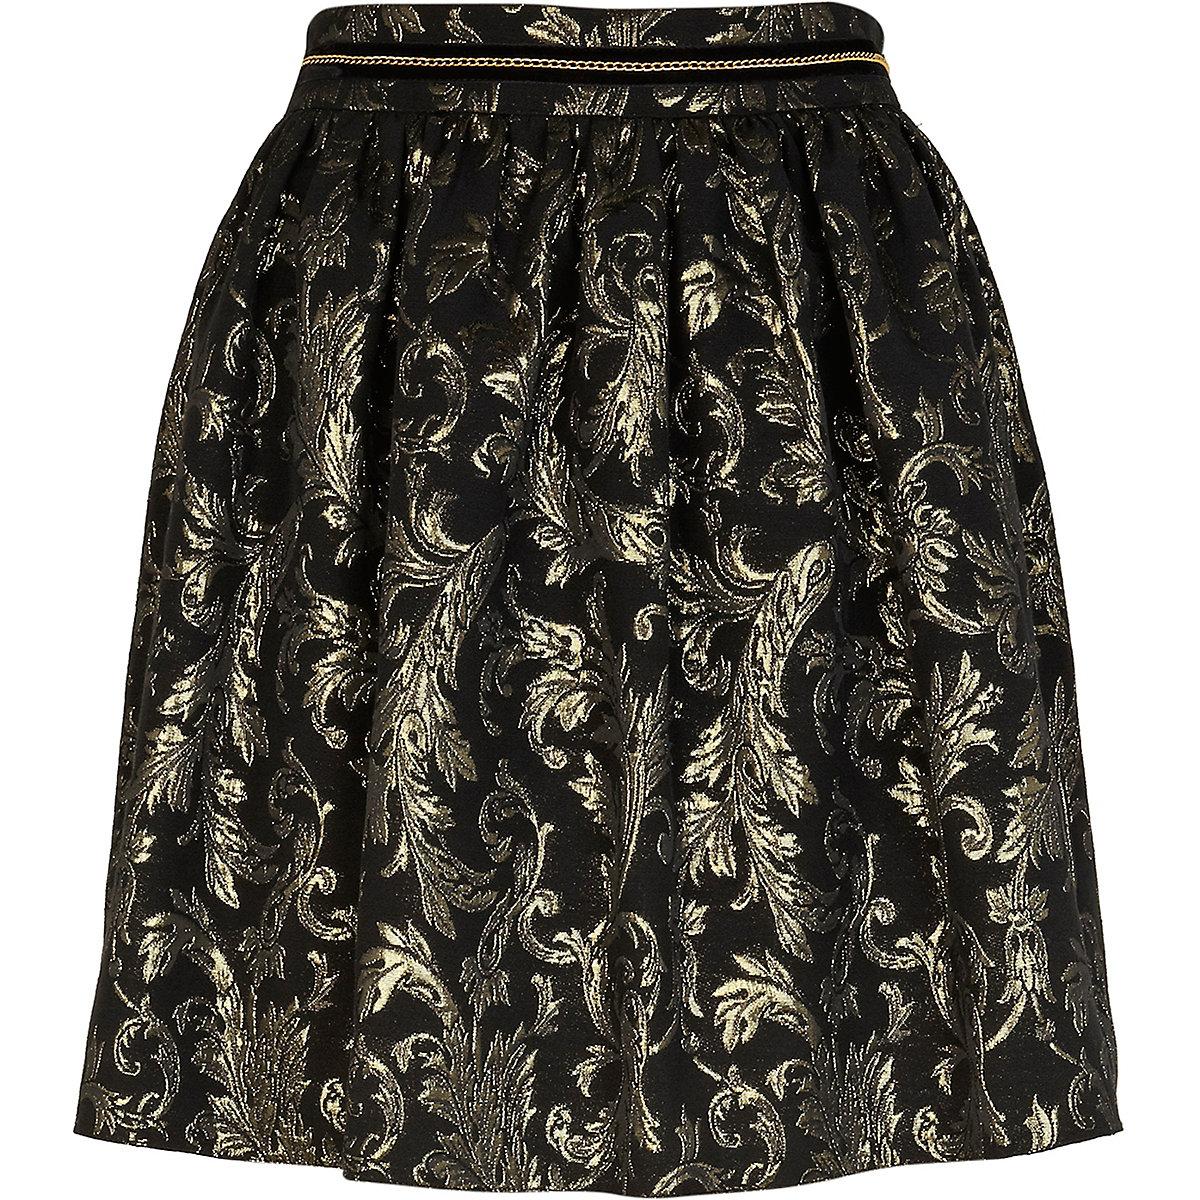 Black brocade mini skirt